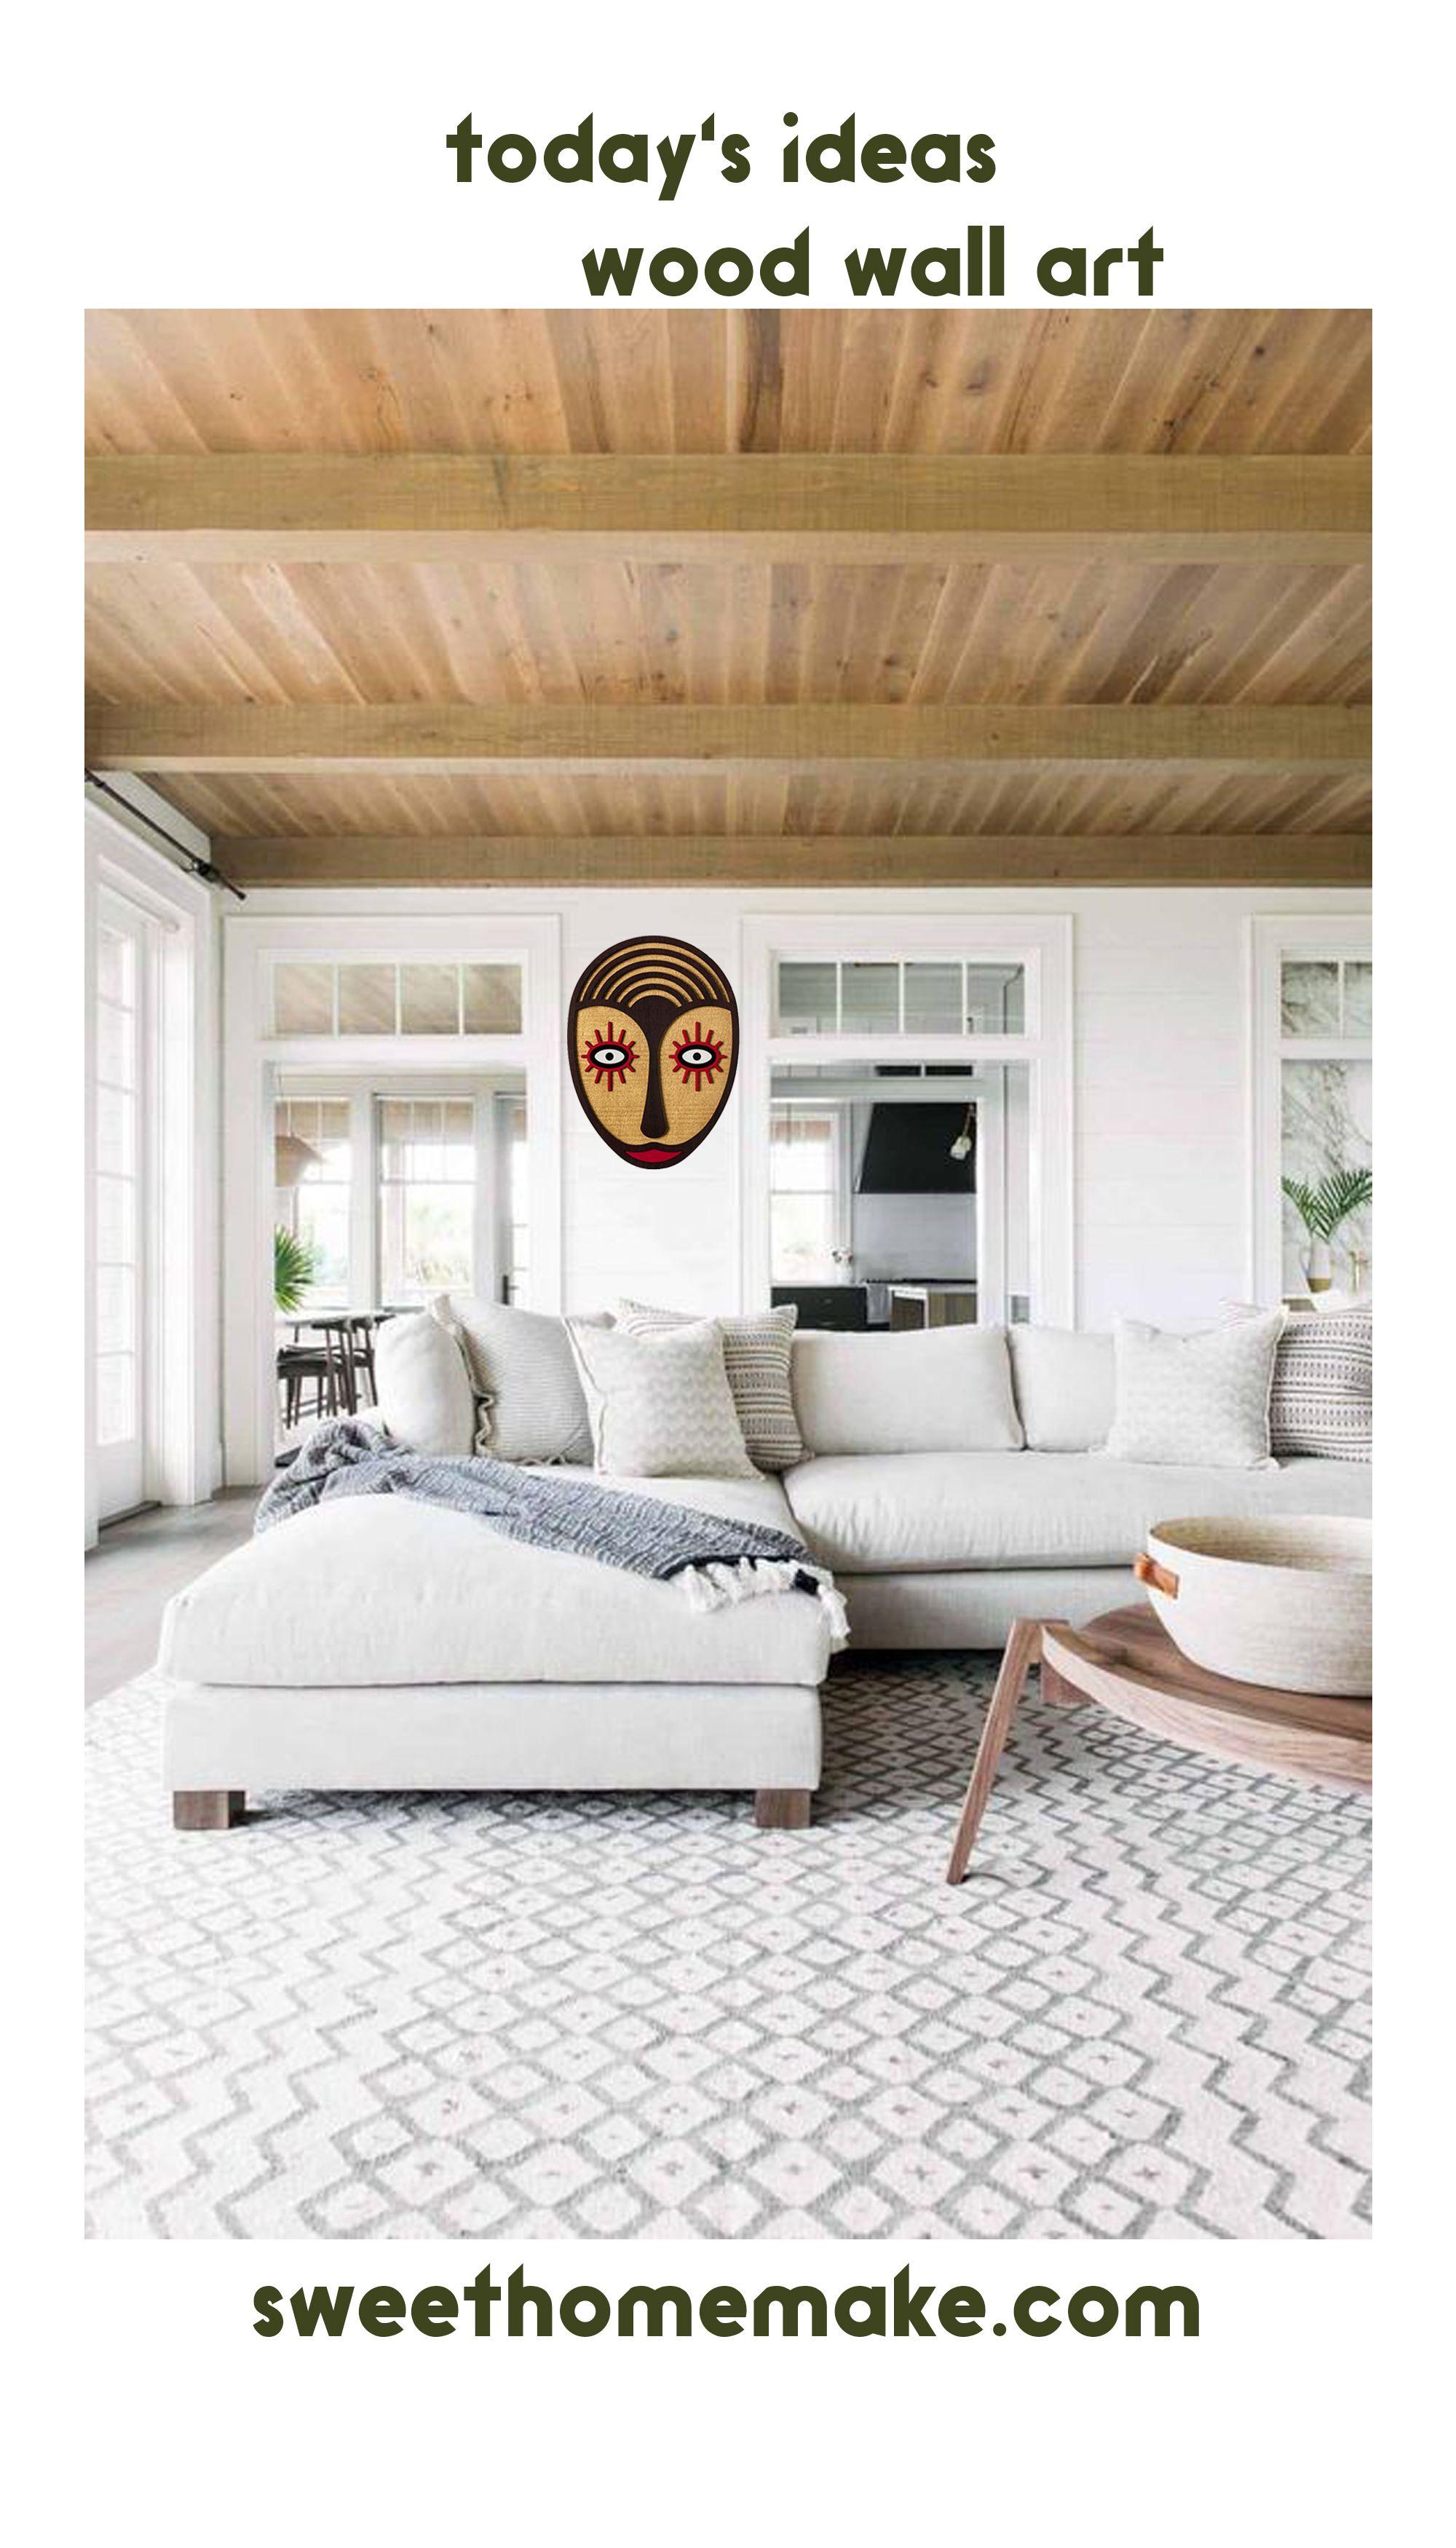 Boho Wall Art With Wooden Bohemian